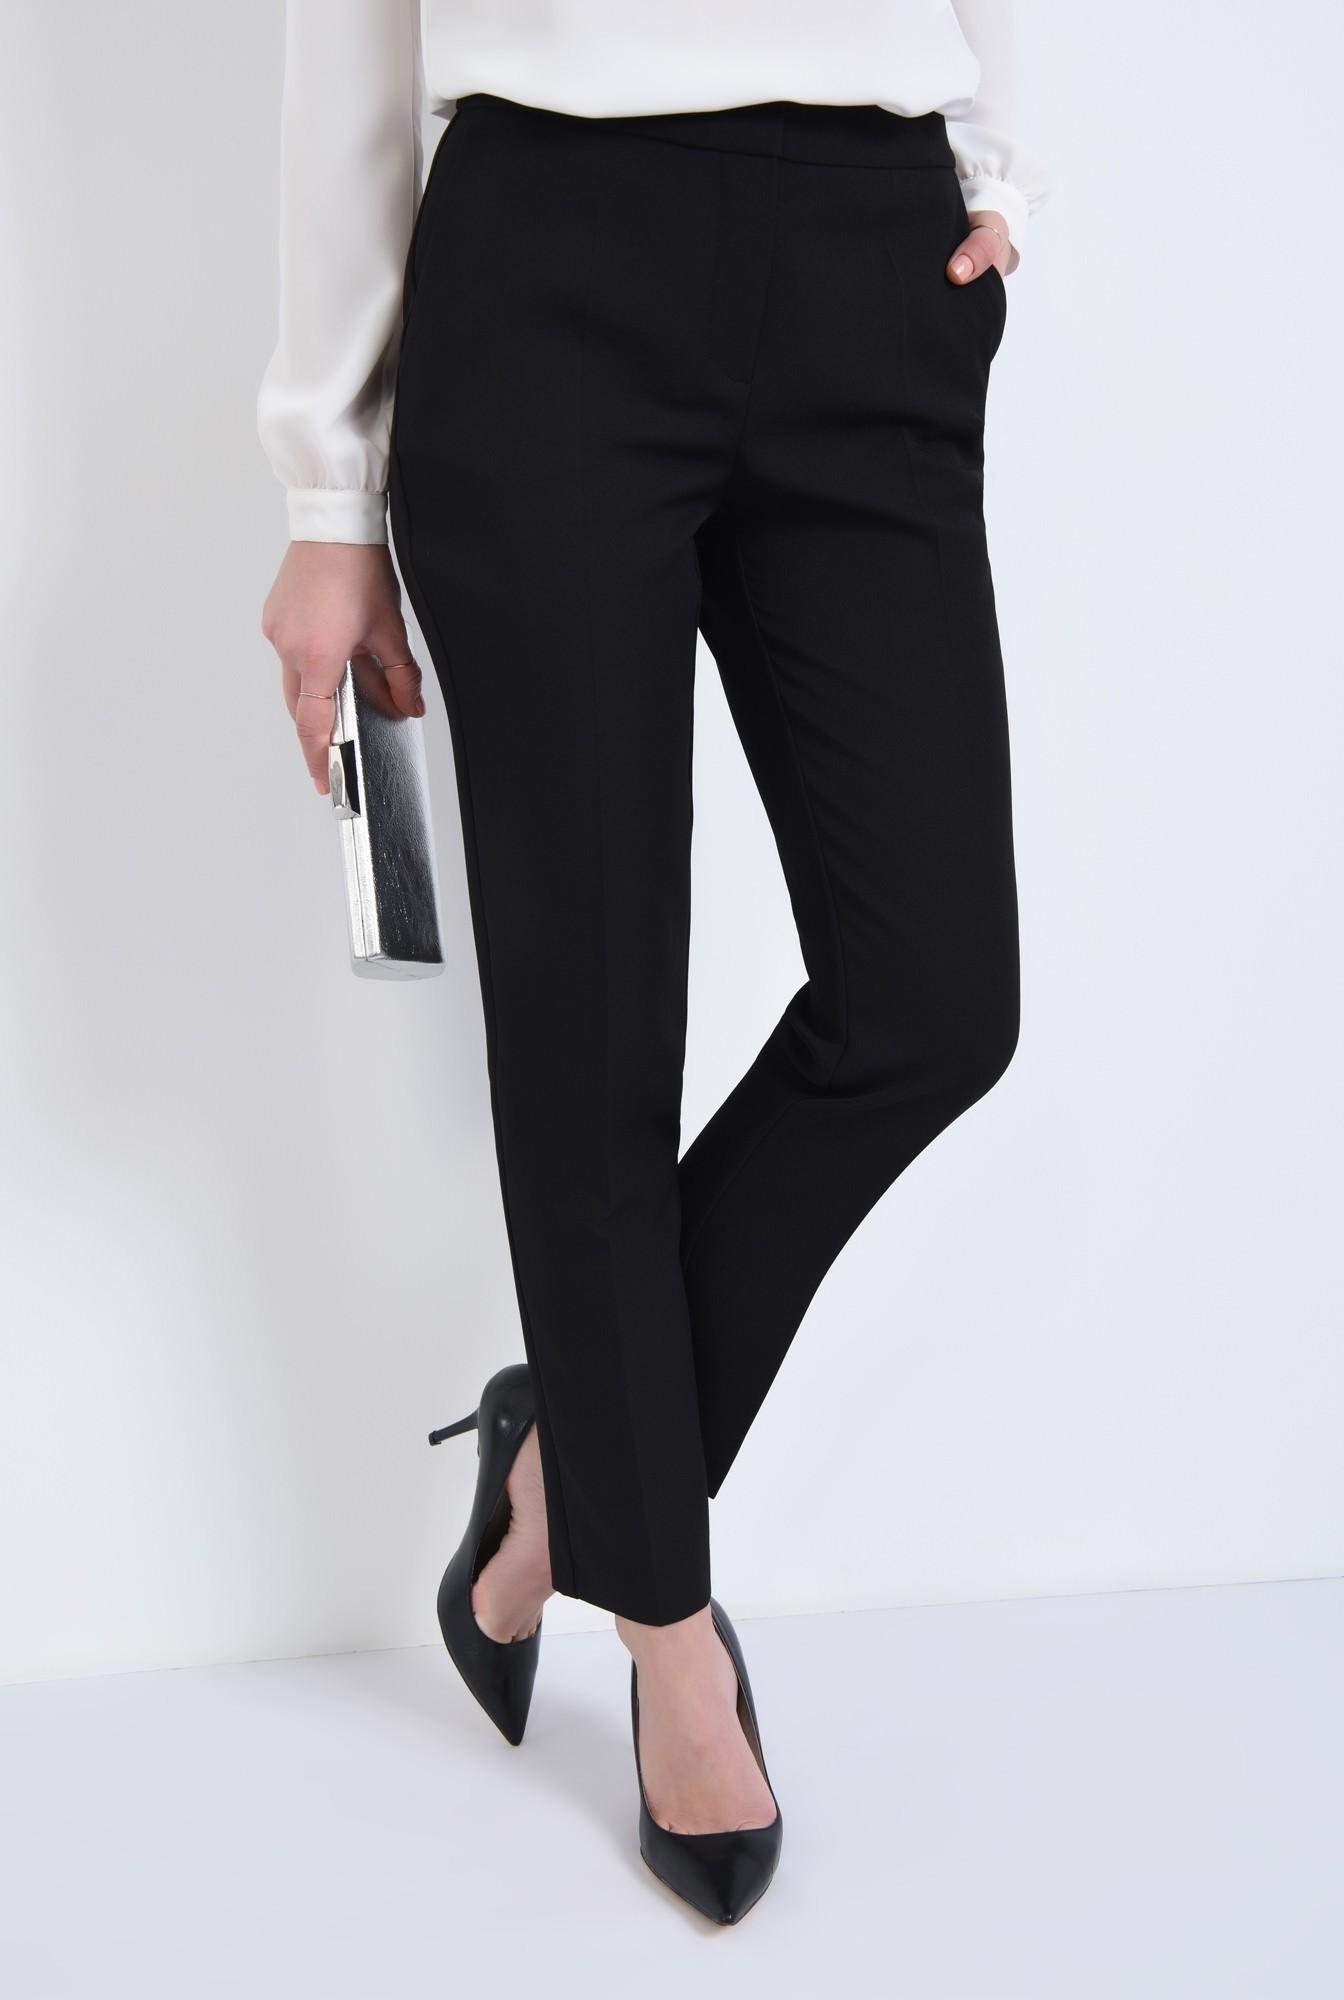 2 - 360 - Pantaloni pana, de birou, lungi, croi tigareta